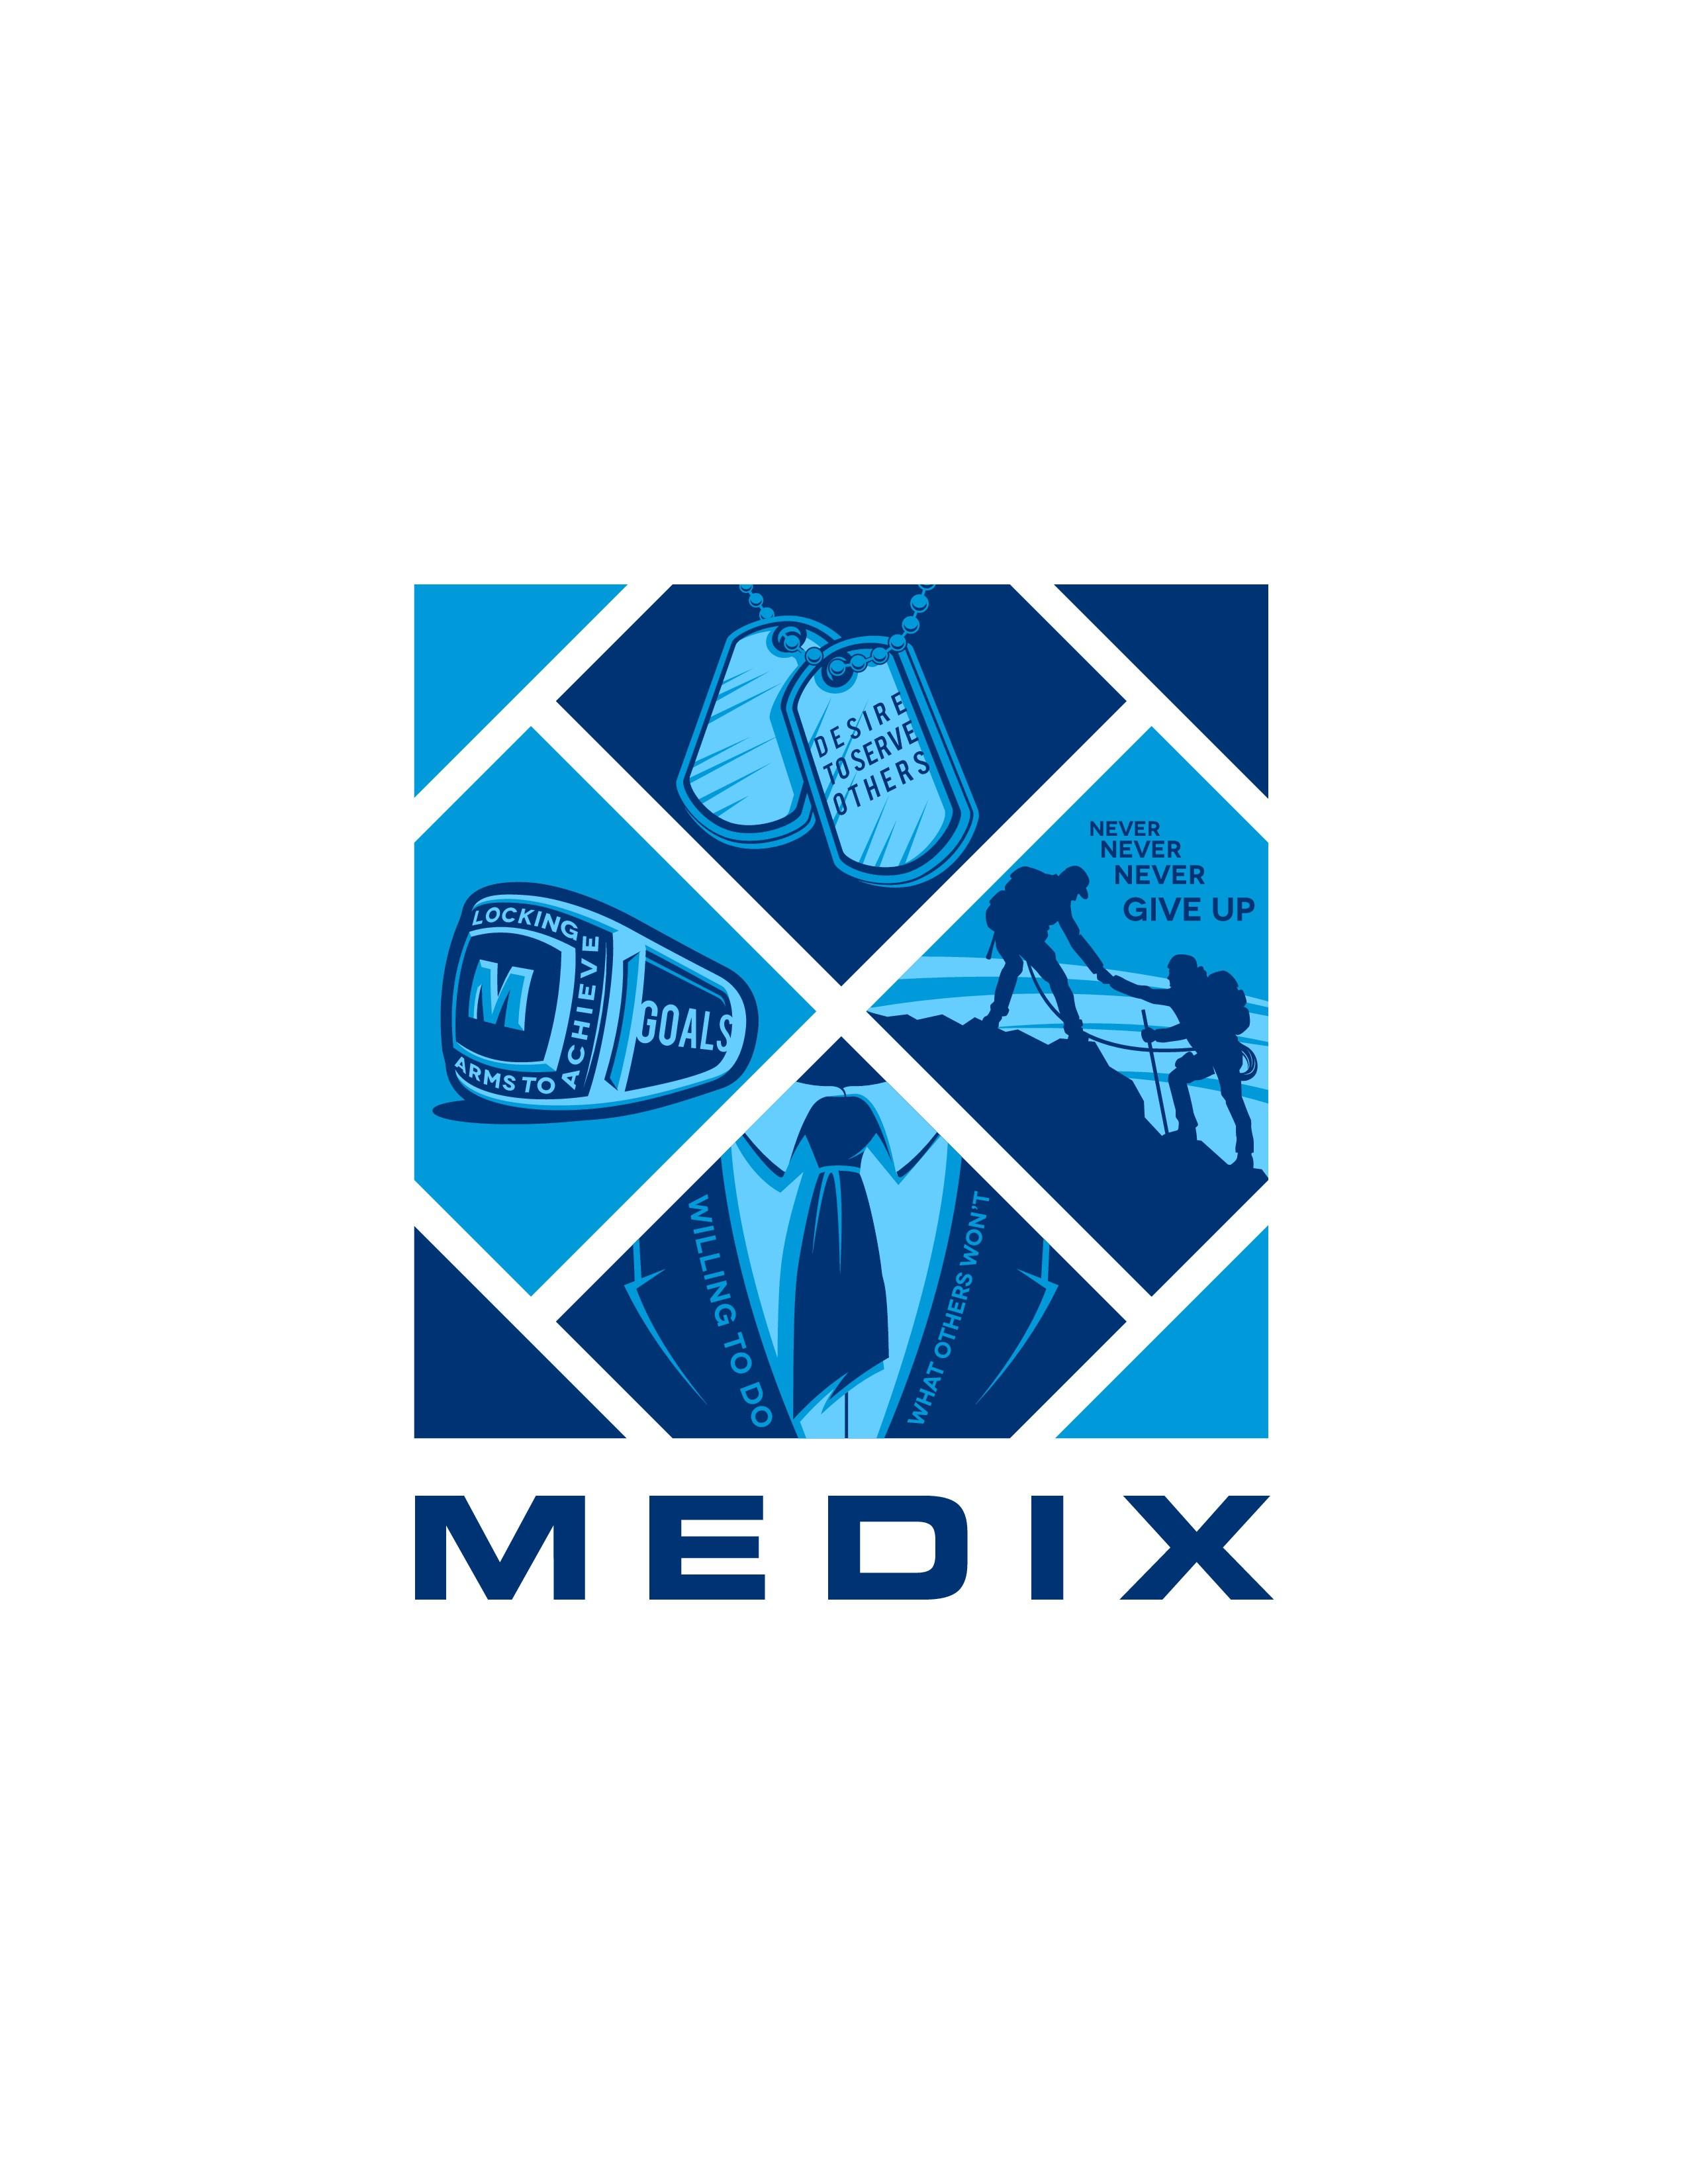 Create a Large Core Values Logo for Medix!